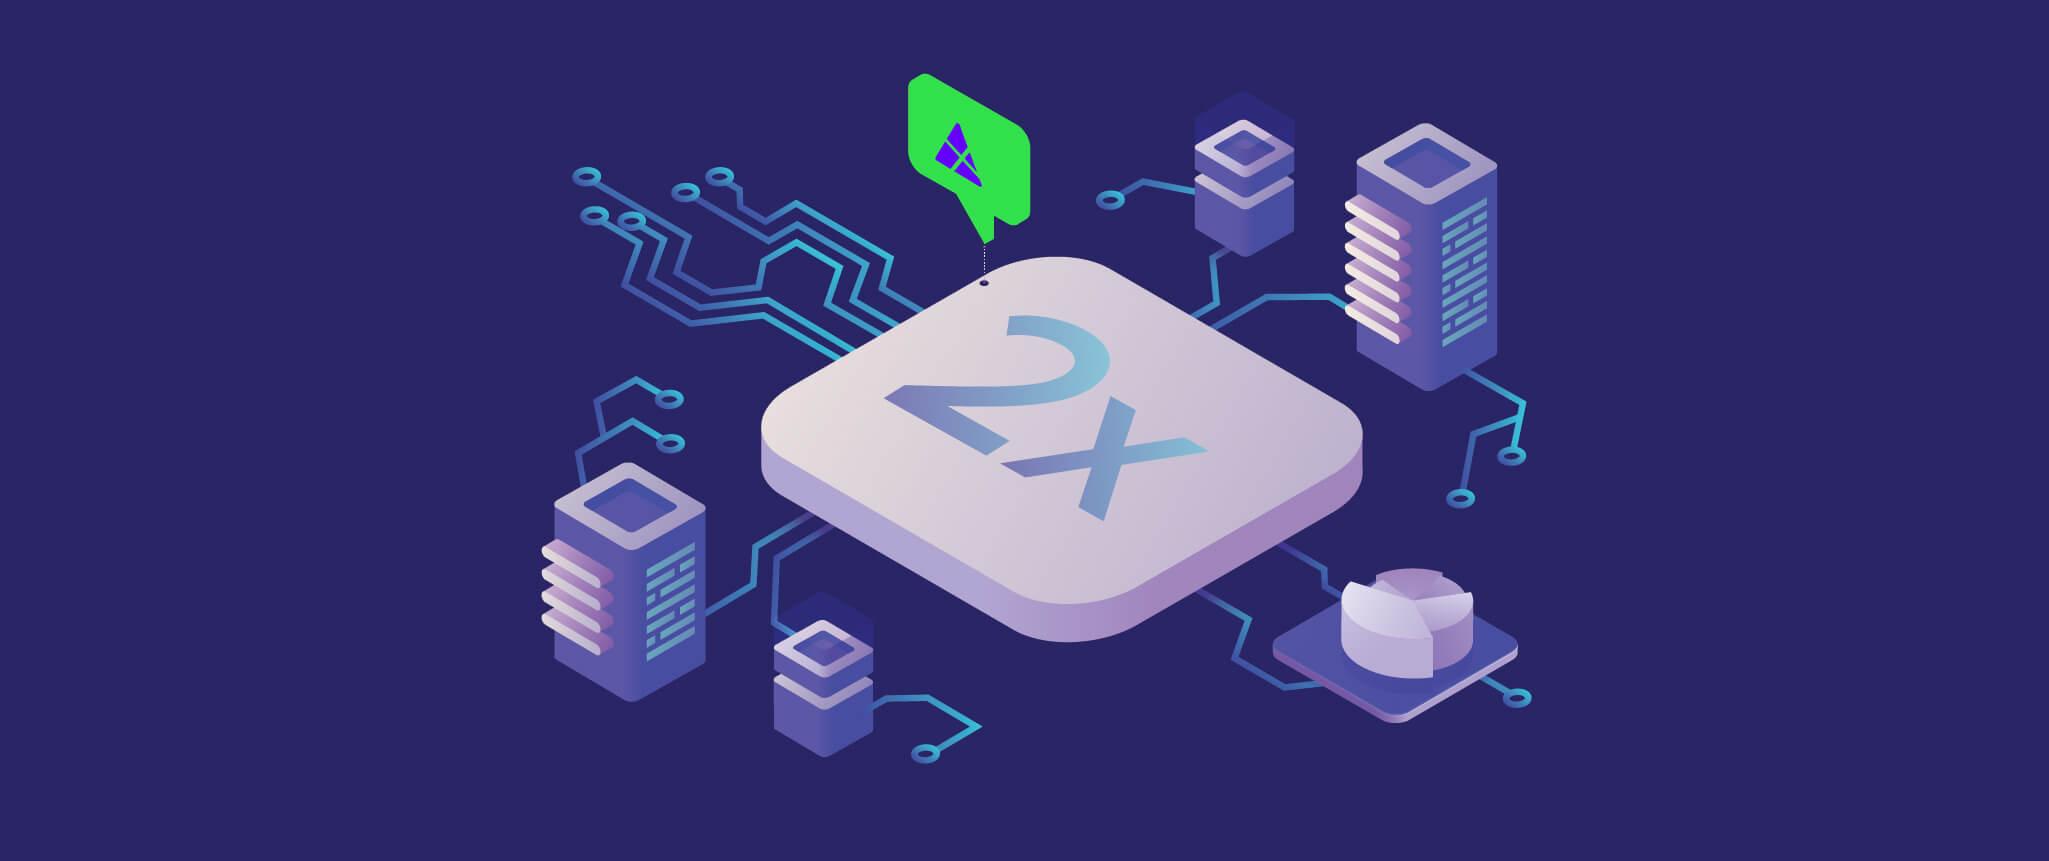 File Sharing App AXEL's Secret to Doubling Retention Rates: Smart User Segmentation